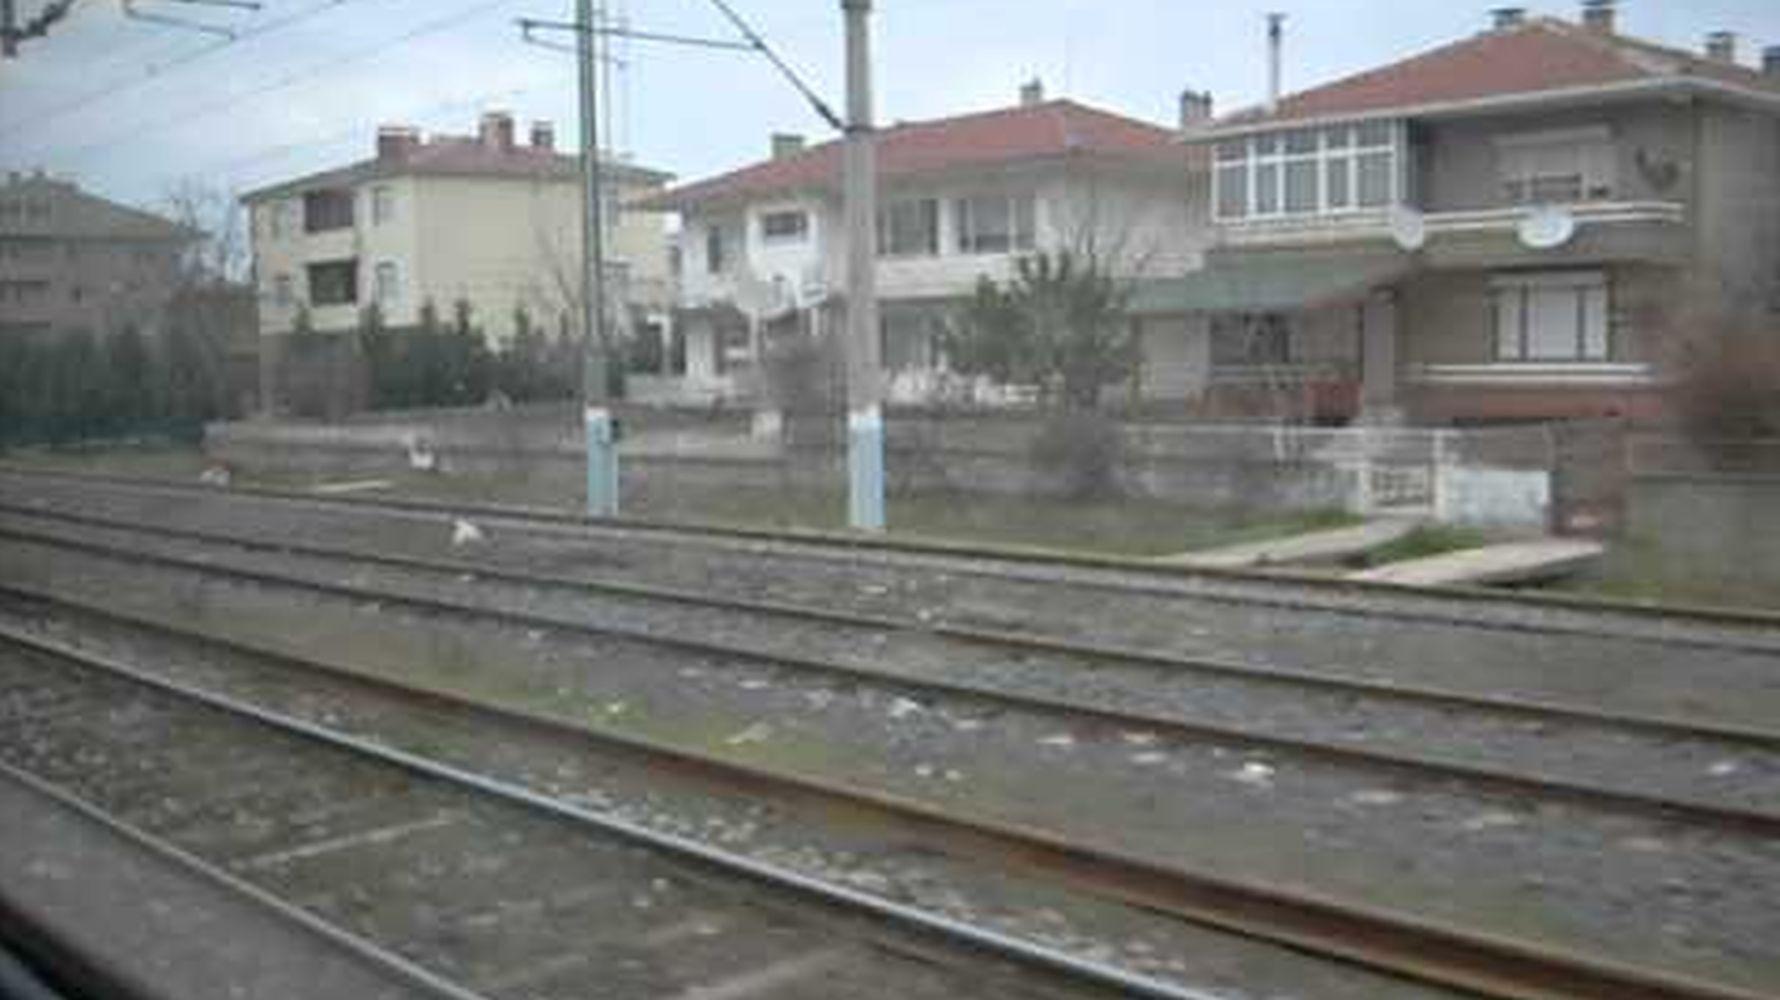 tekirdag muratli railway line project line construction ustyapi works tender